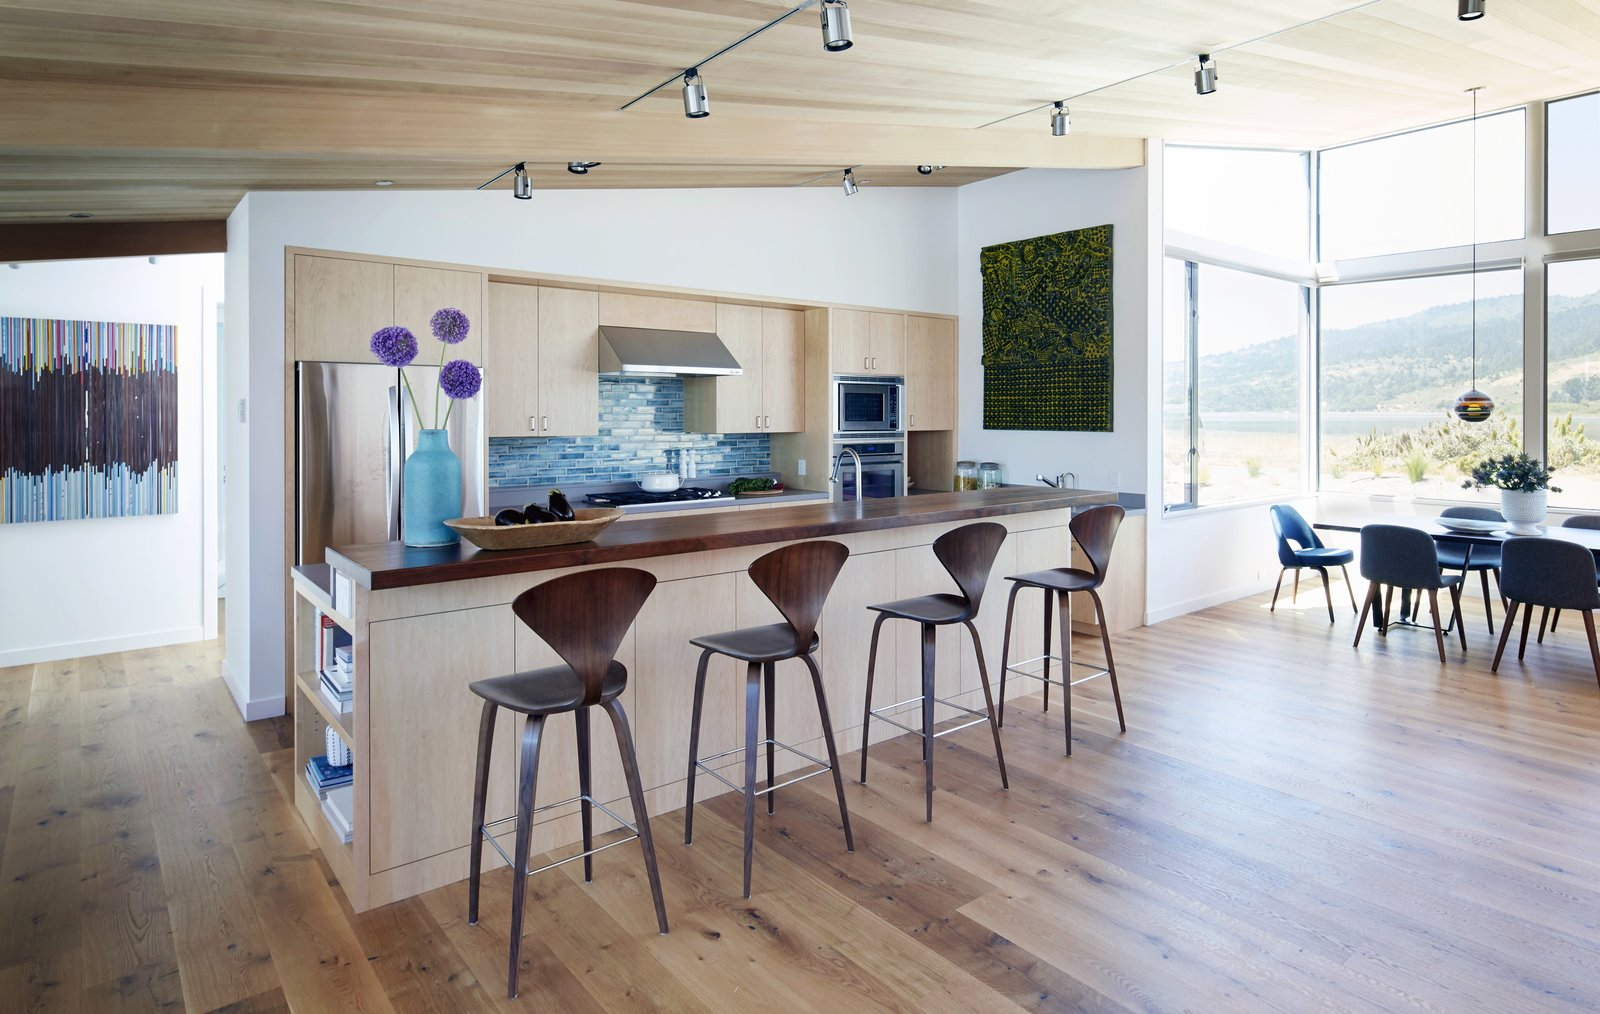 #TurnbullGriffinHaesloop #interior #kitchen #diningroom